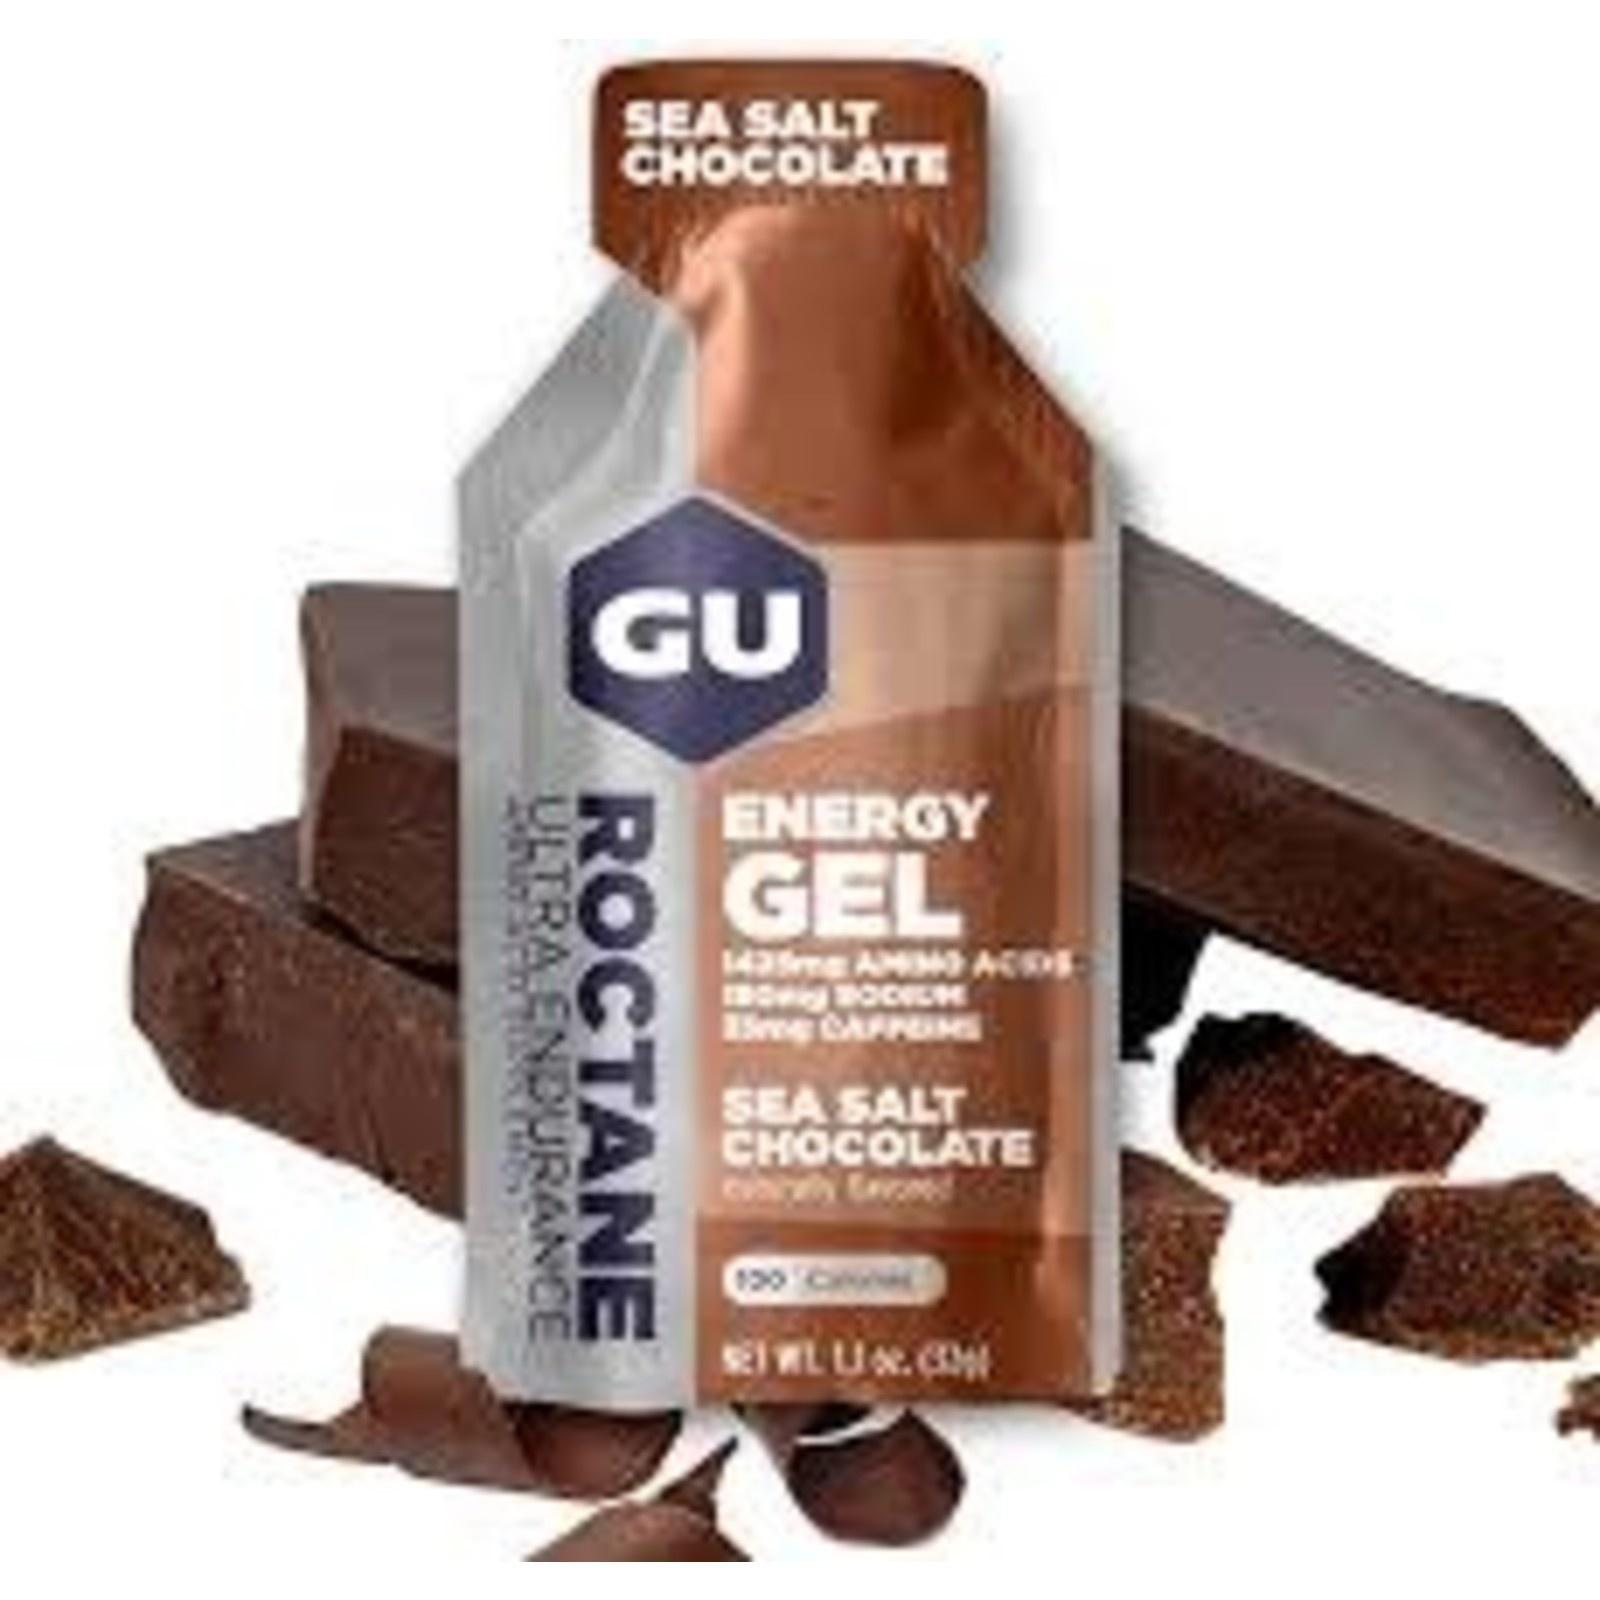 Gu Roctane Gel 6-Pack - Sea Salt Chocolate